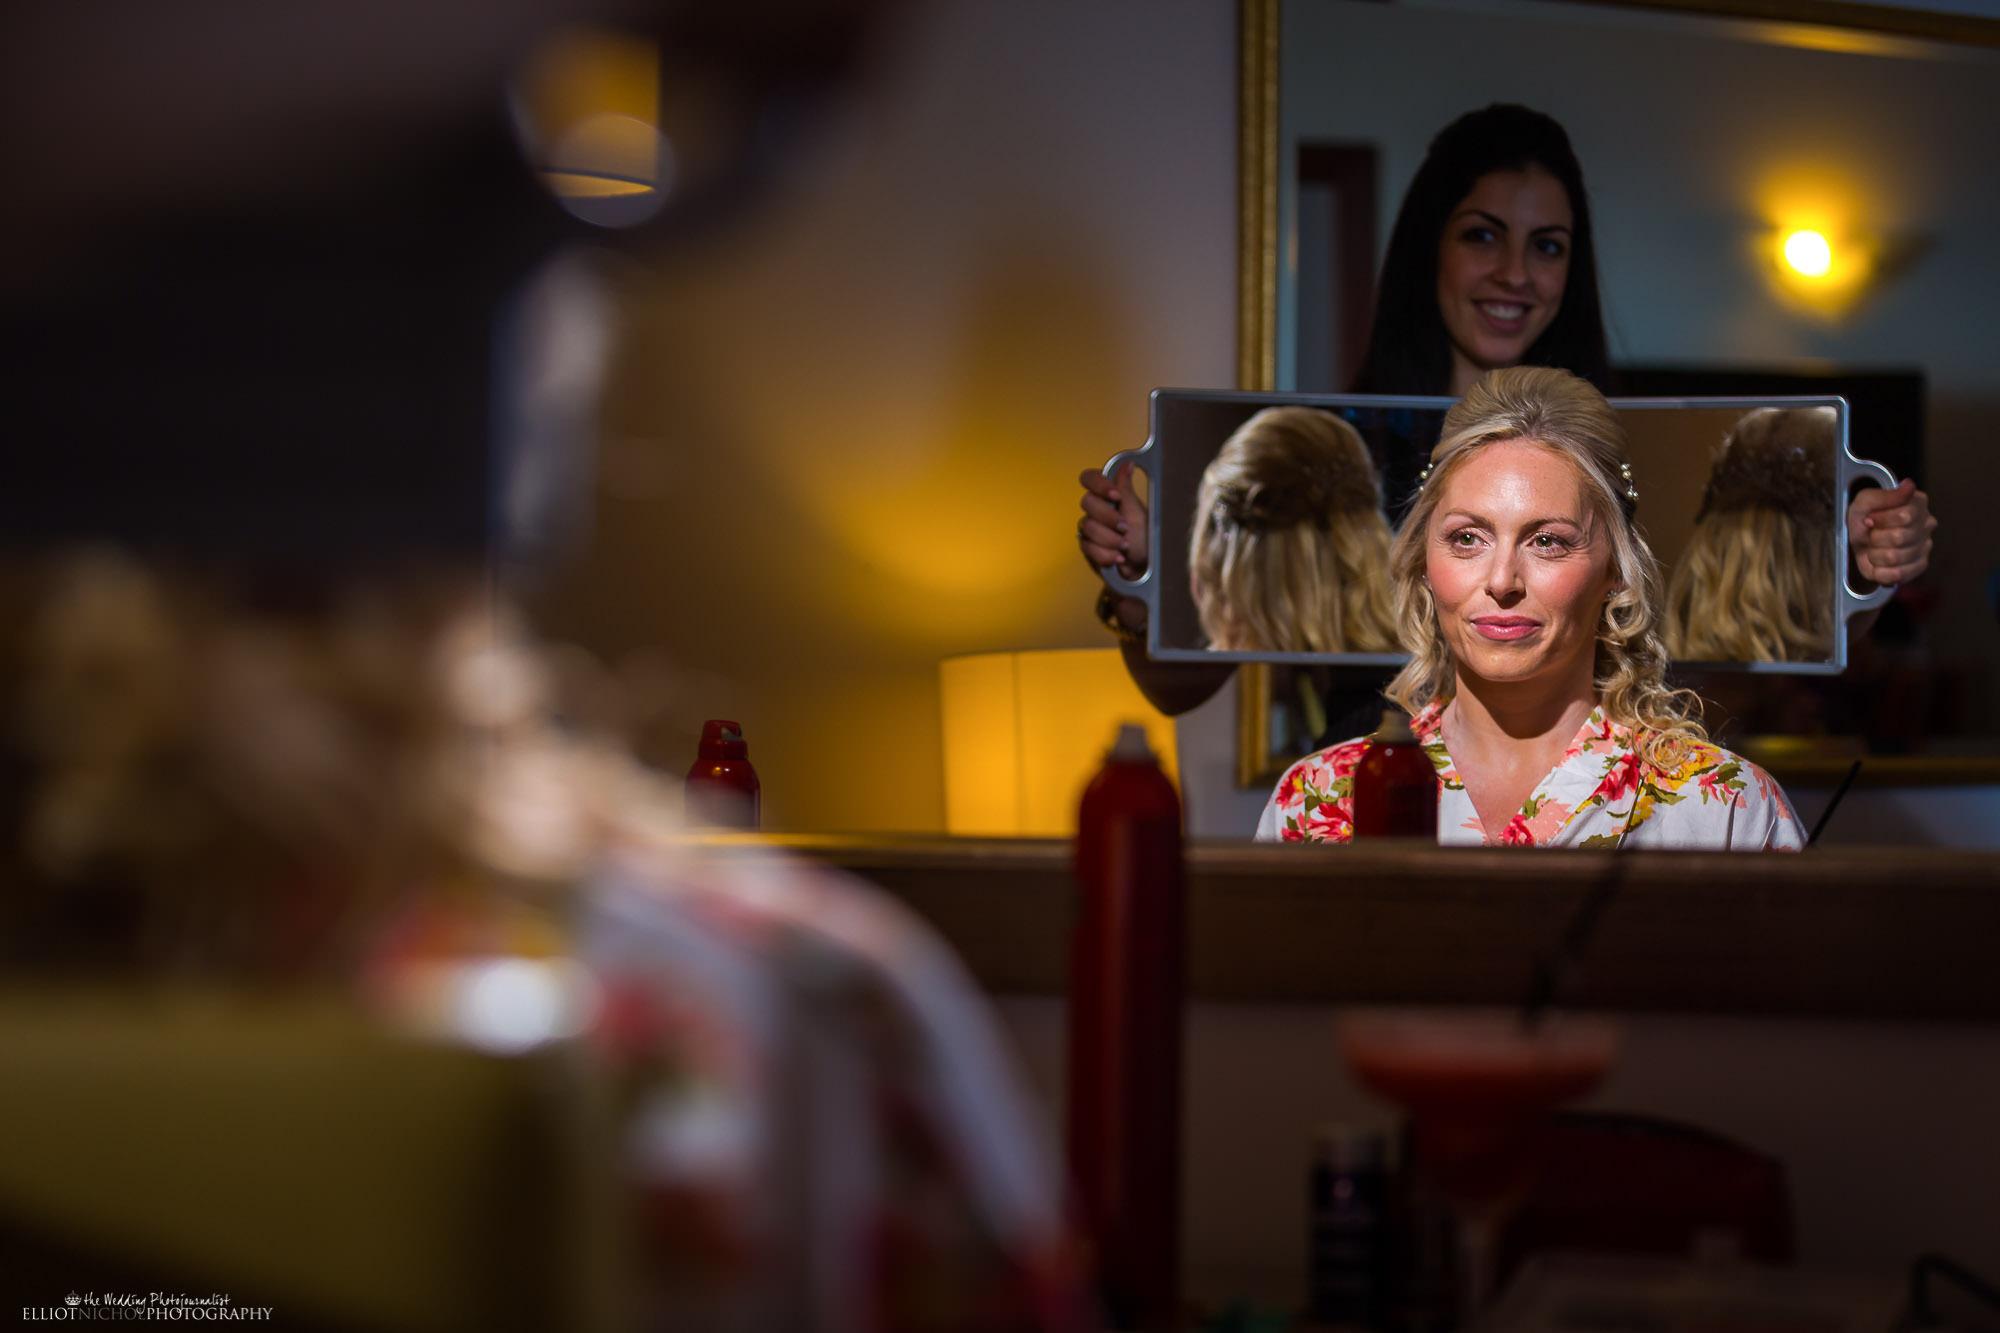 Bride-hair-brides-stylist-wedding-getting-ready-photographer-photography-destination-Malta